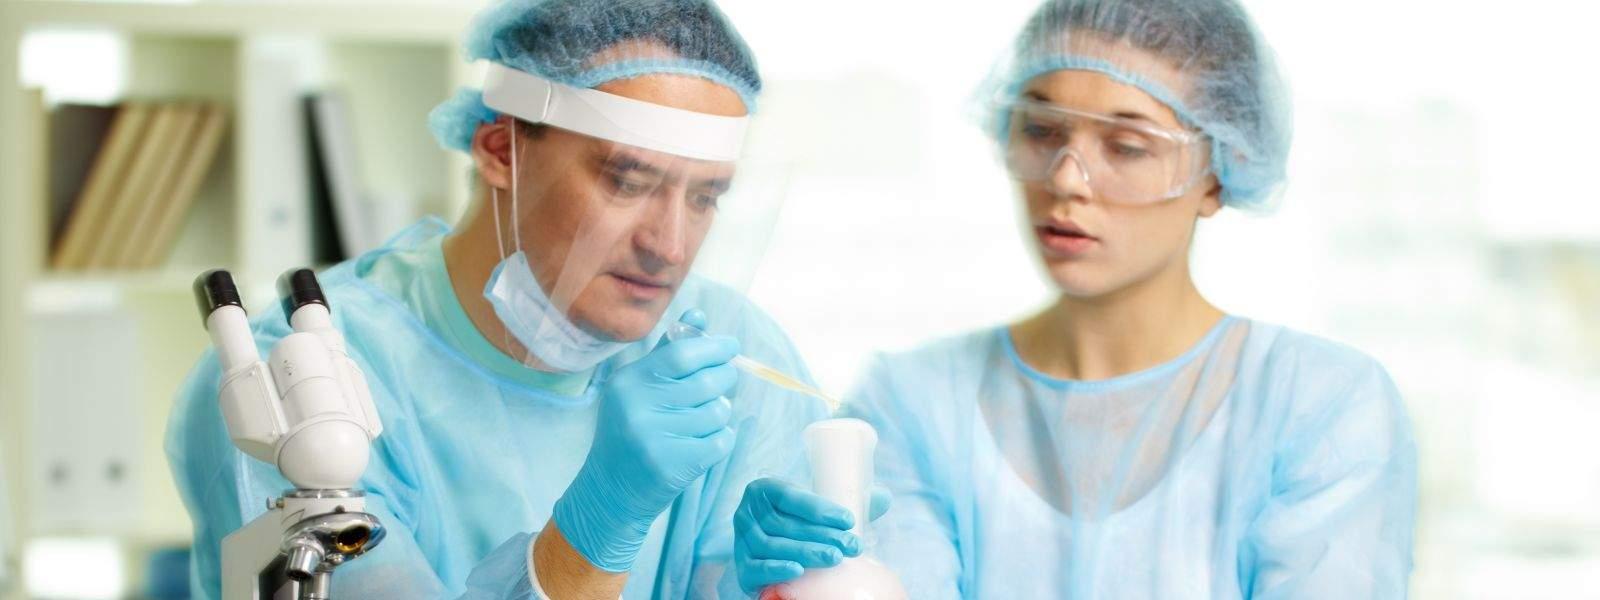 Farmácia Magistral Alopática